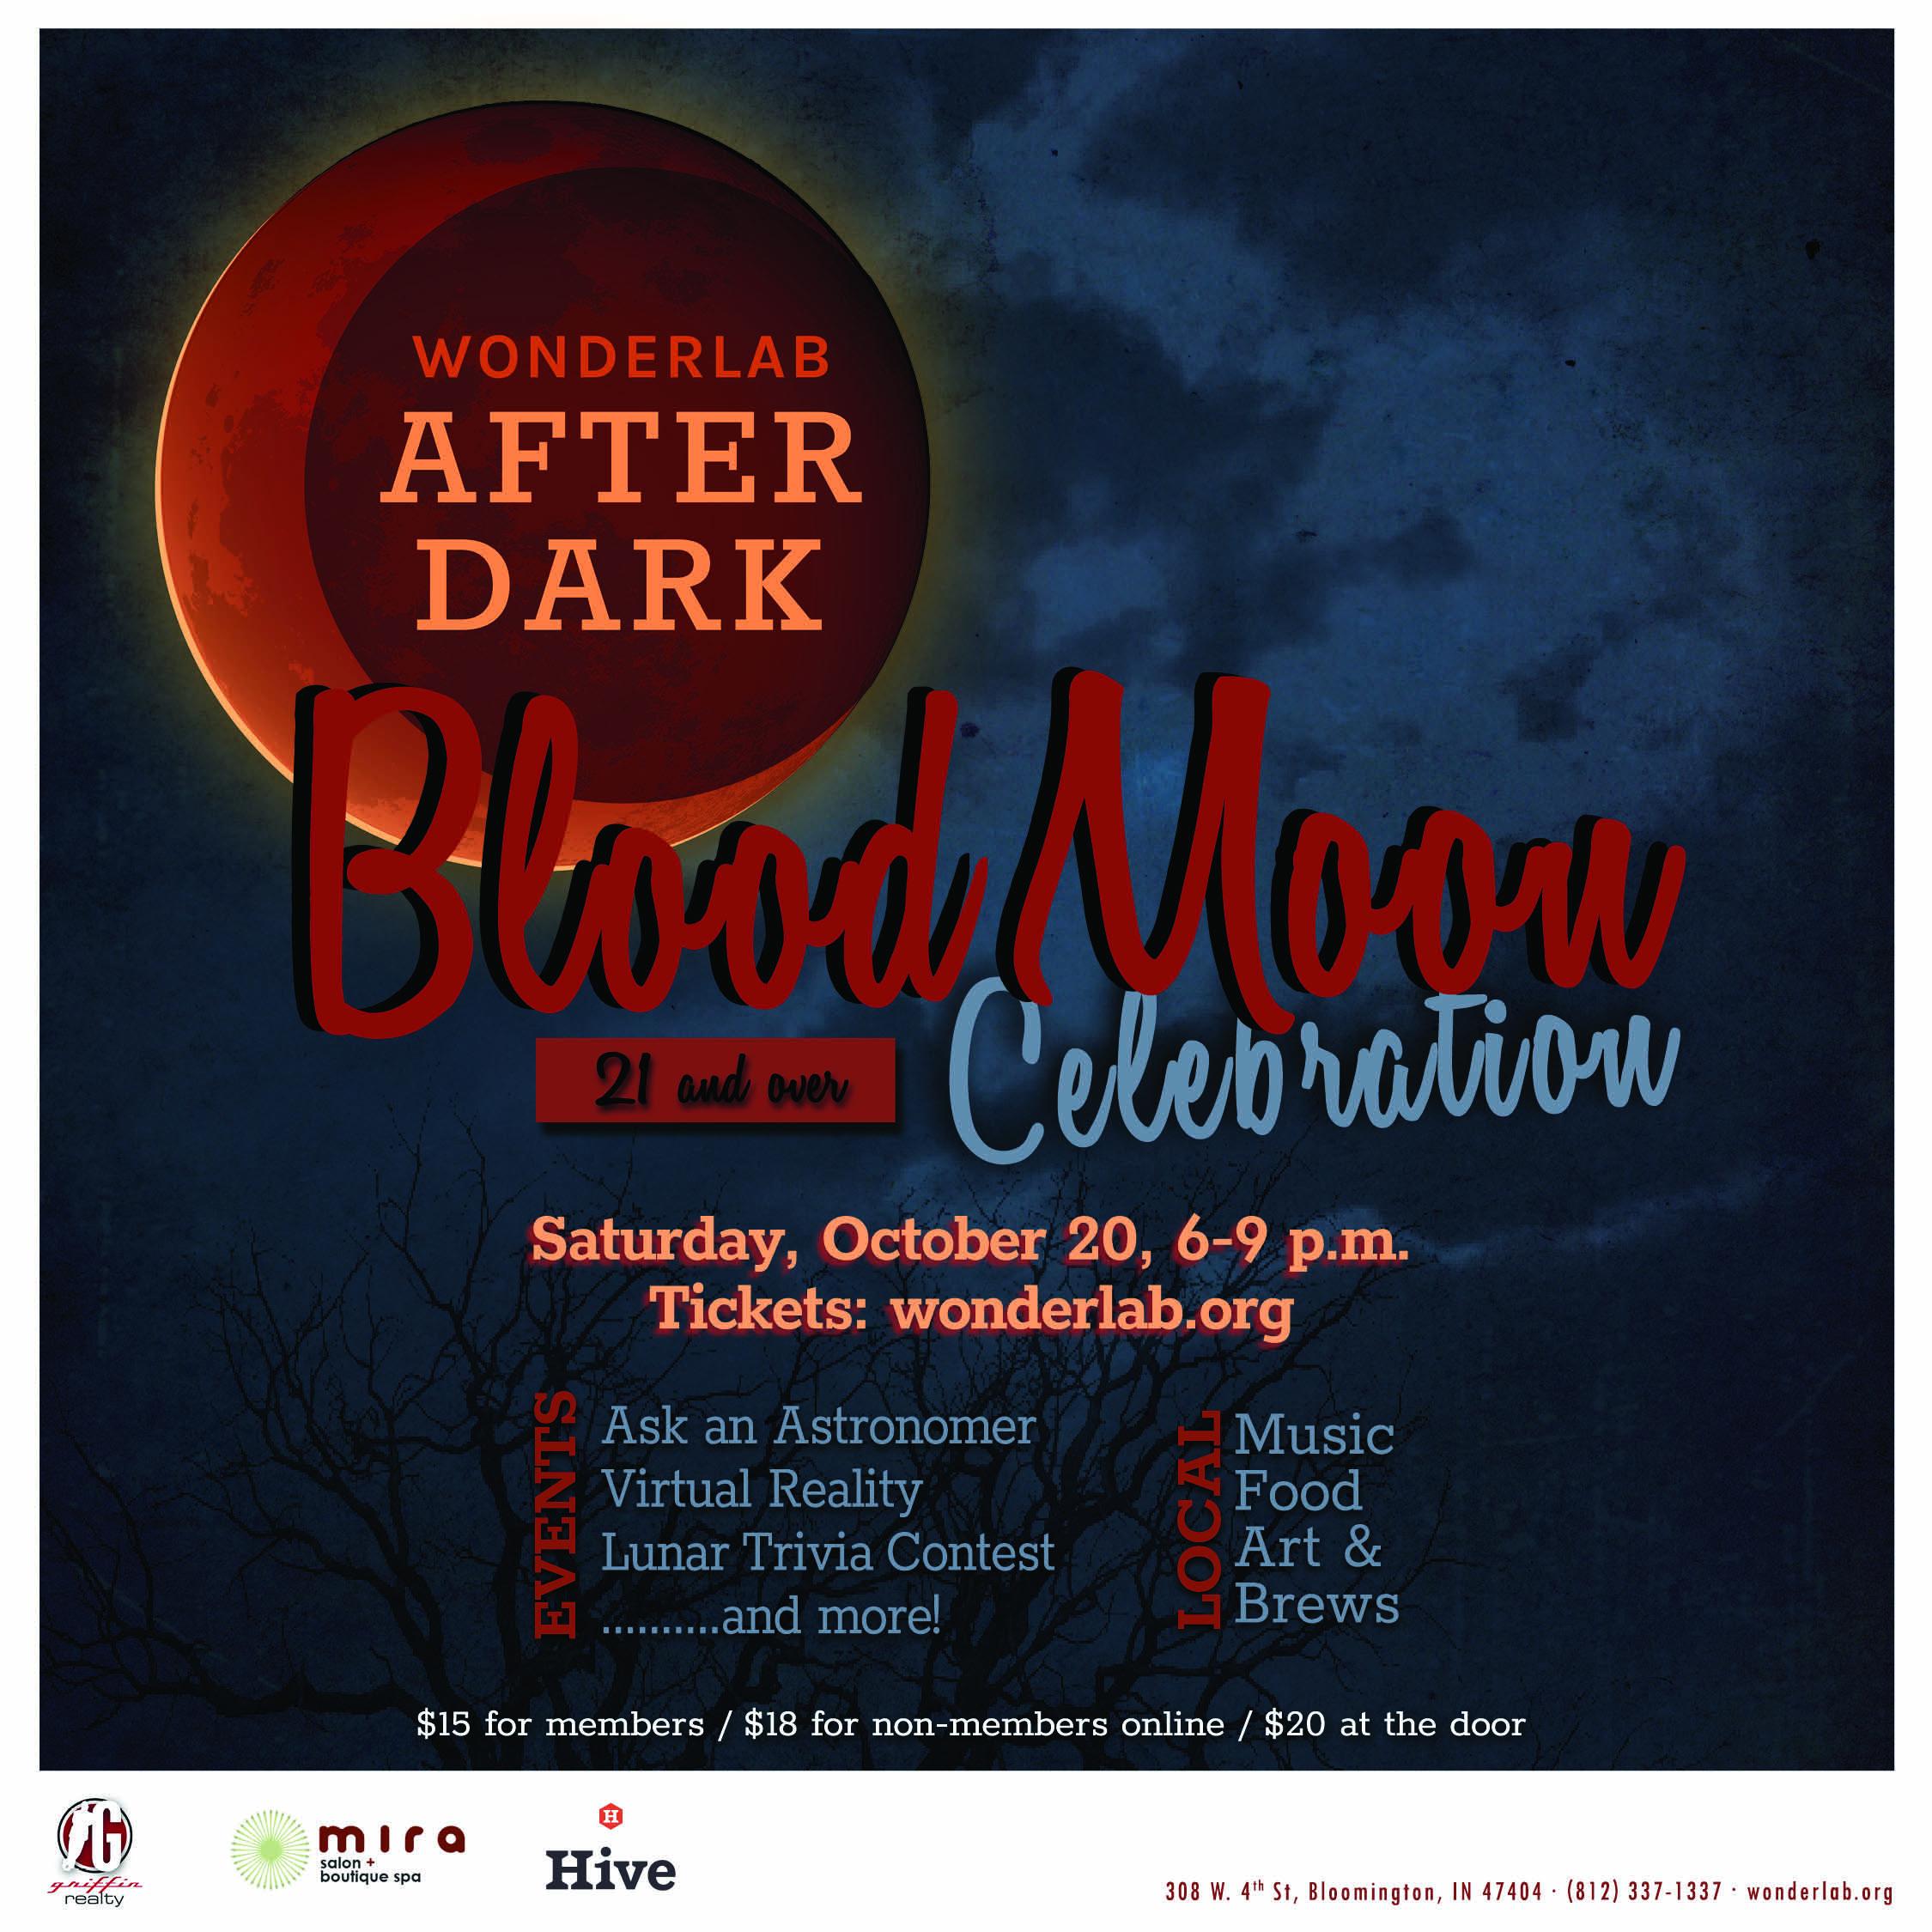 Wonderlab After Dark Blood Moon Celebration Wonderlab Museum Of